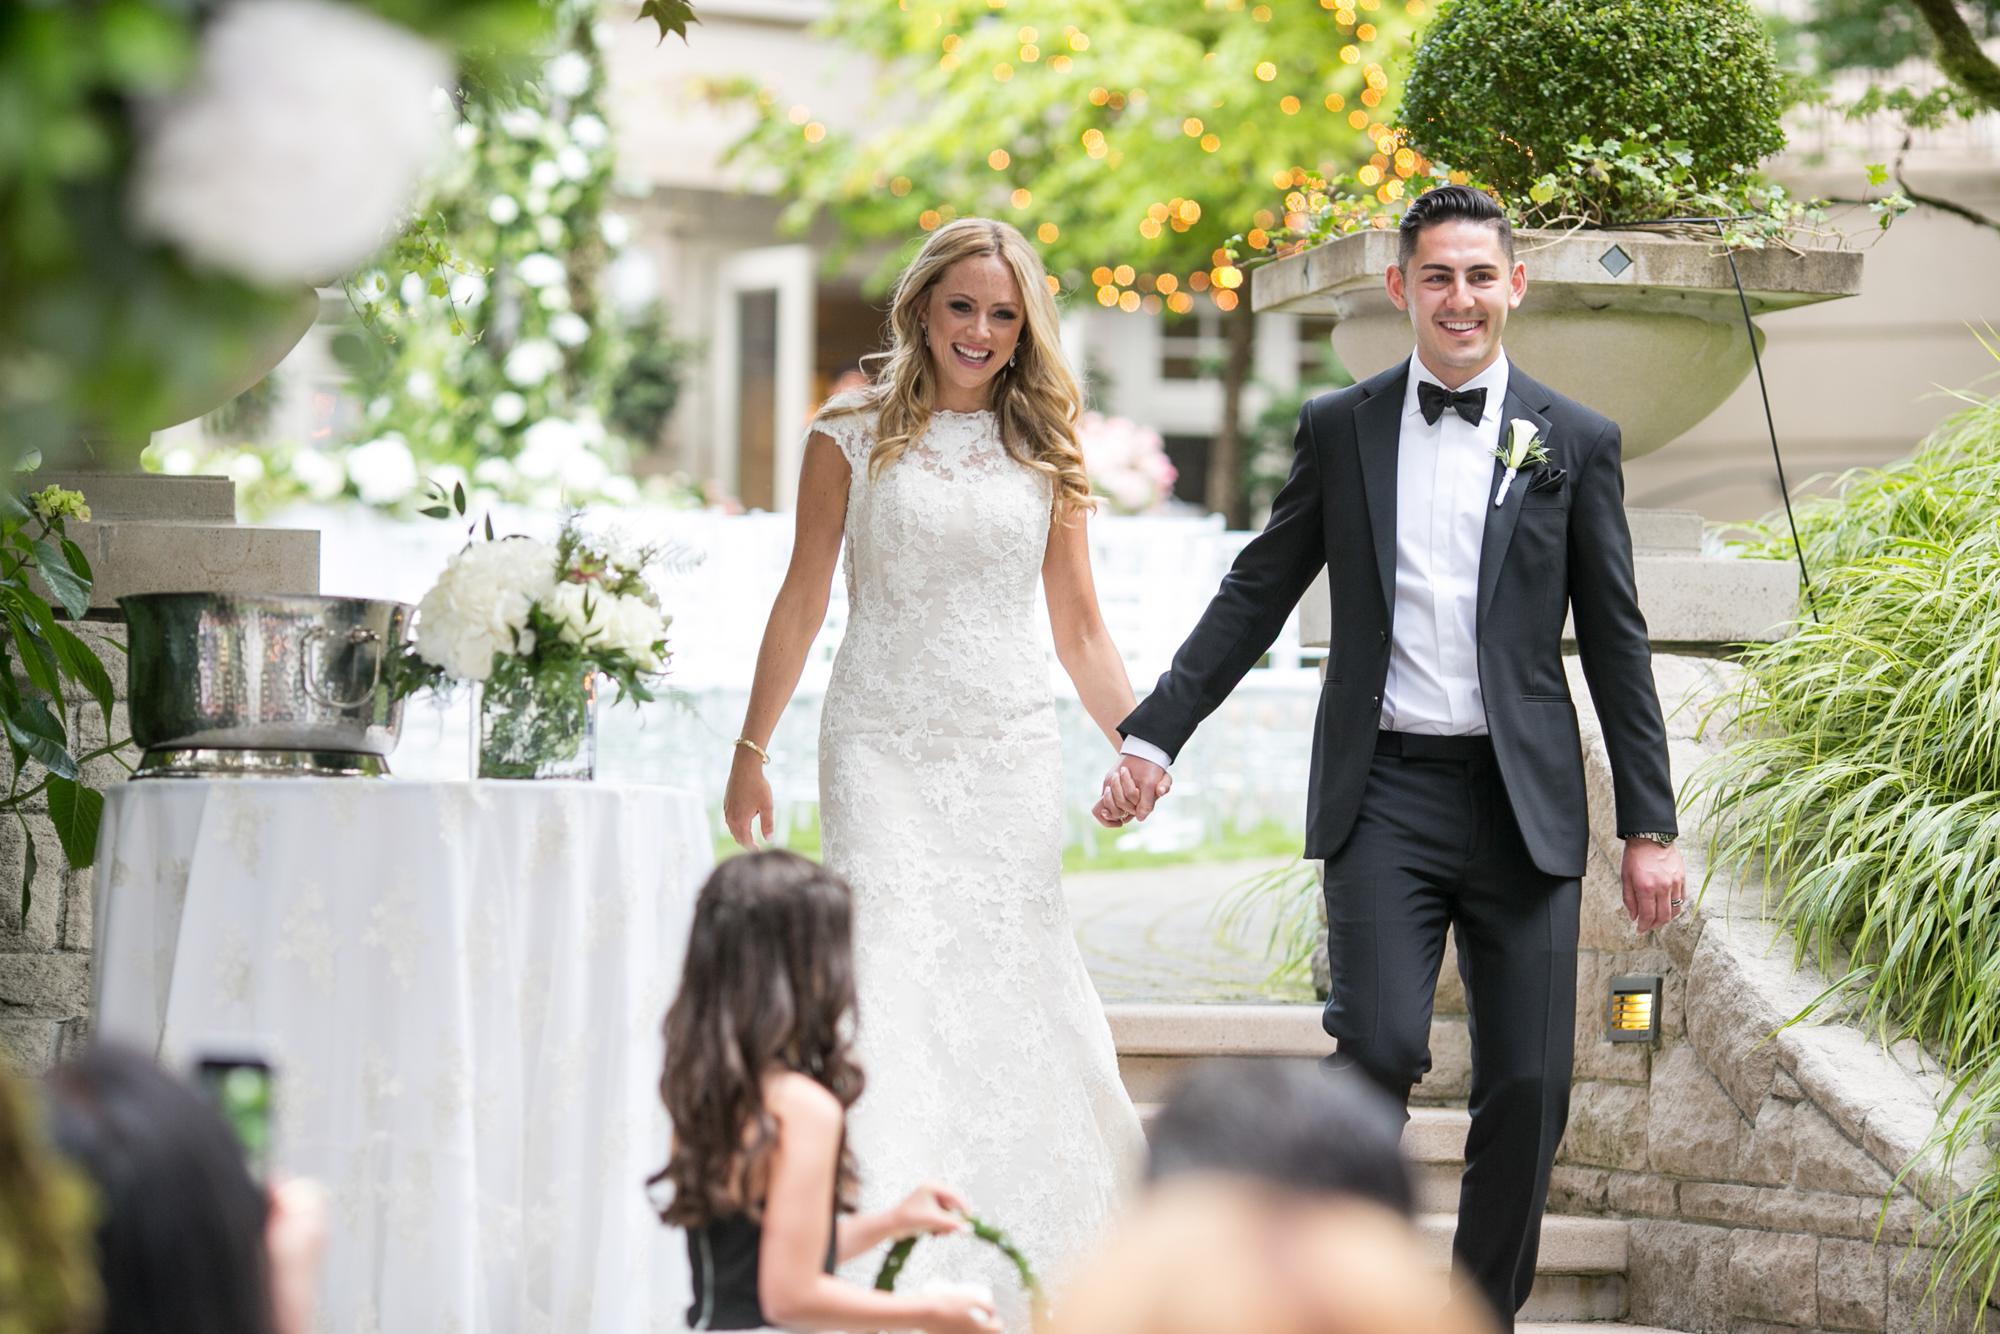 vancouver-luxury-wedding-photographer-lori-miles-068.jpg